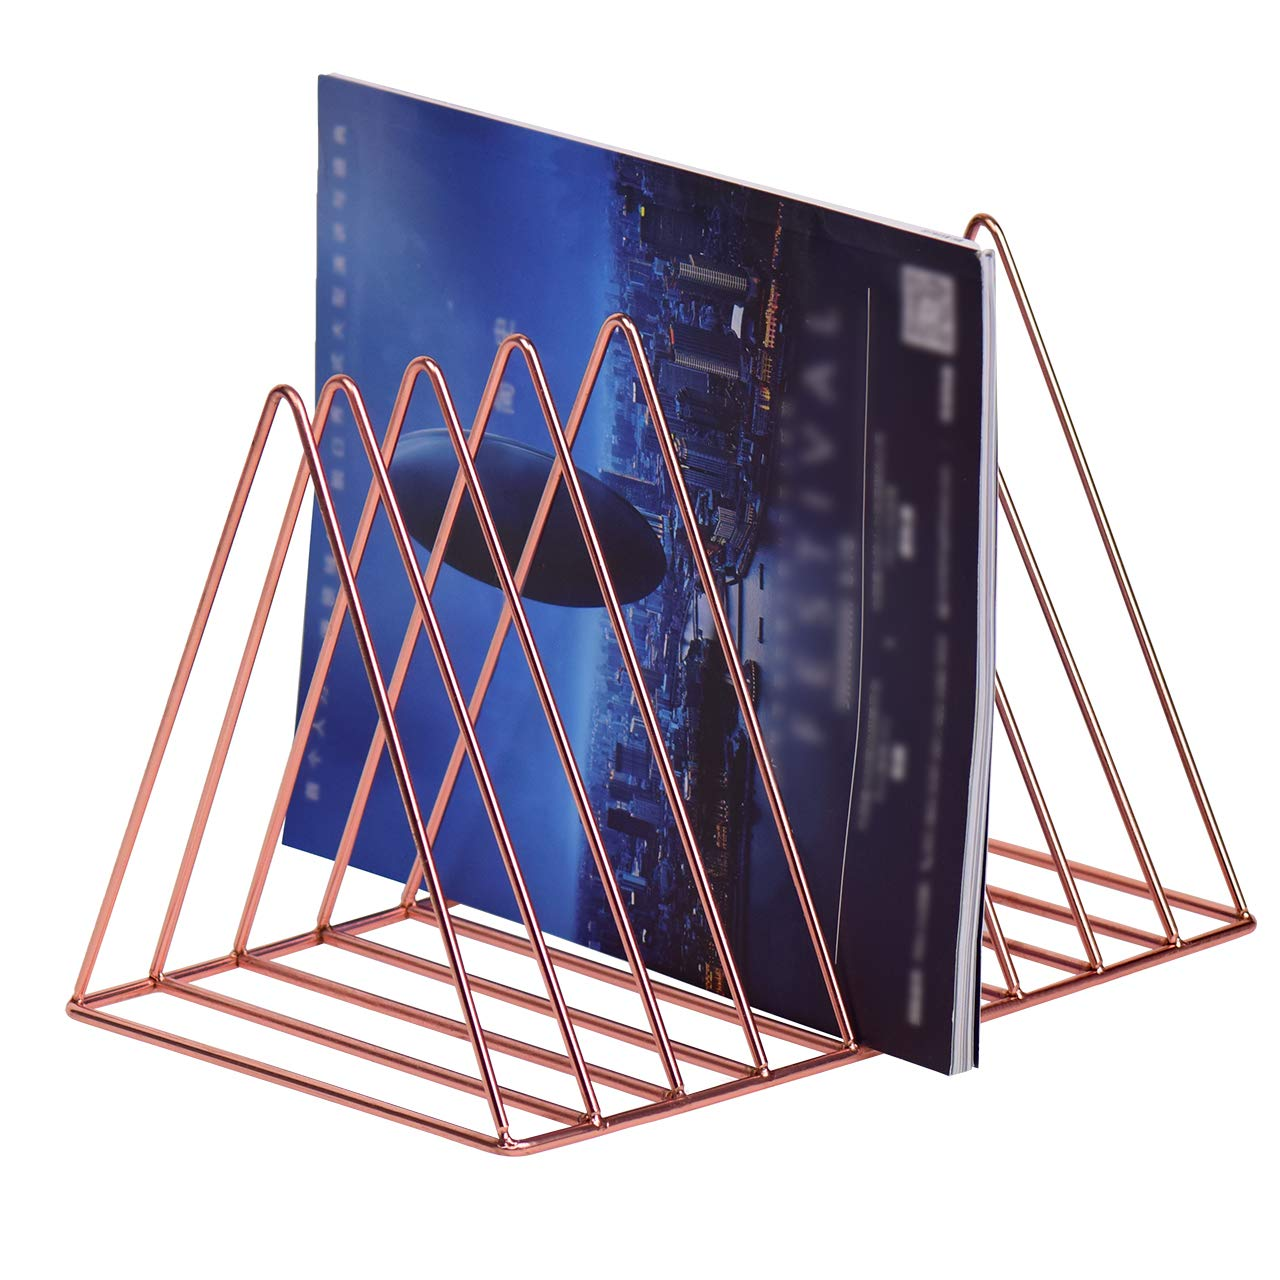 Rose Gold Eyourlife Triangle File Organizer Wire Collection 9 Slot Newspaper Organizer Journals Book Rack Bookshelf Magazine Holder for Office Home Decor